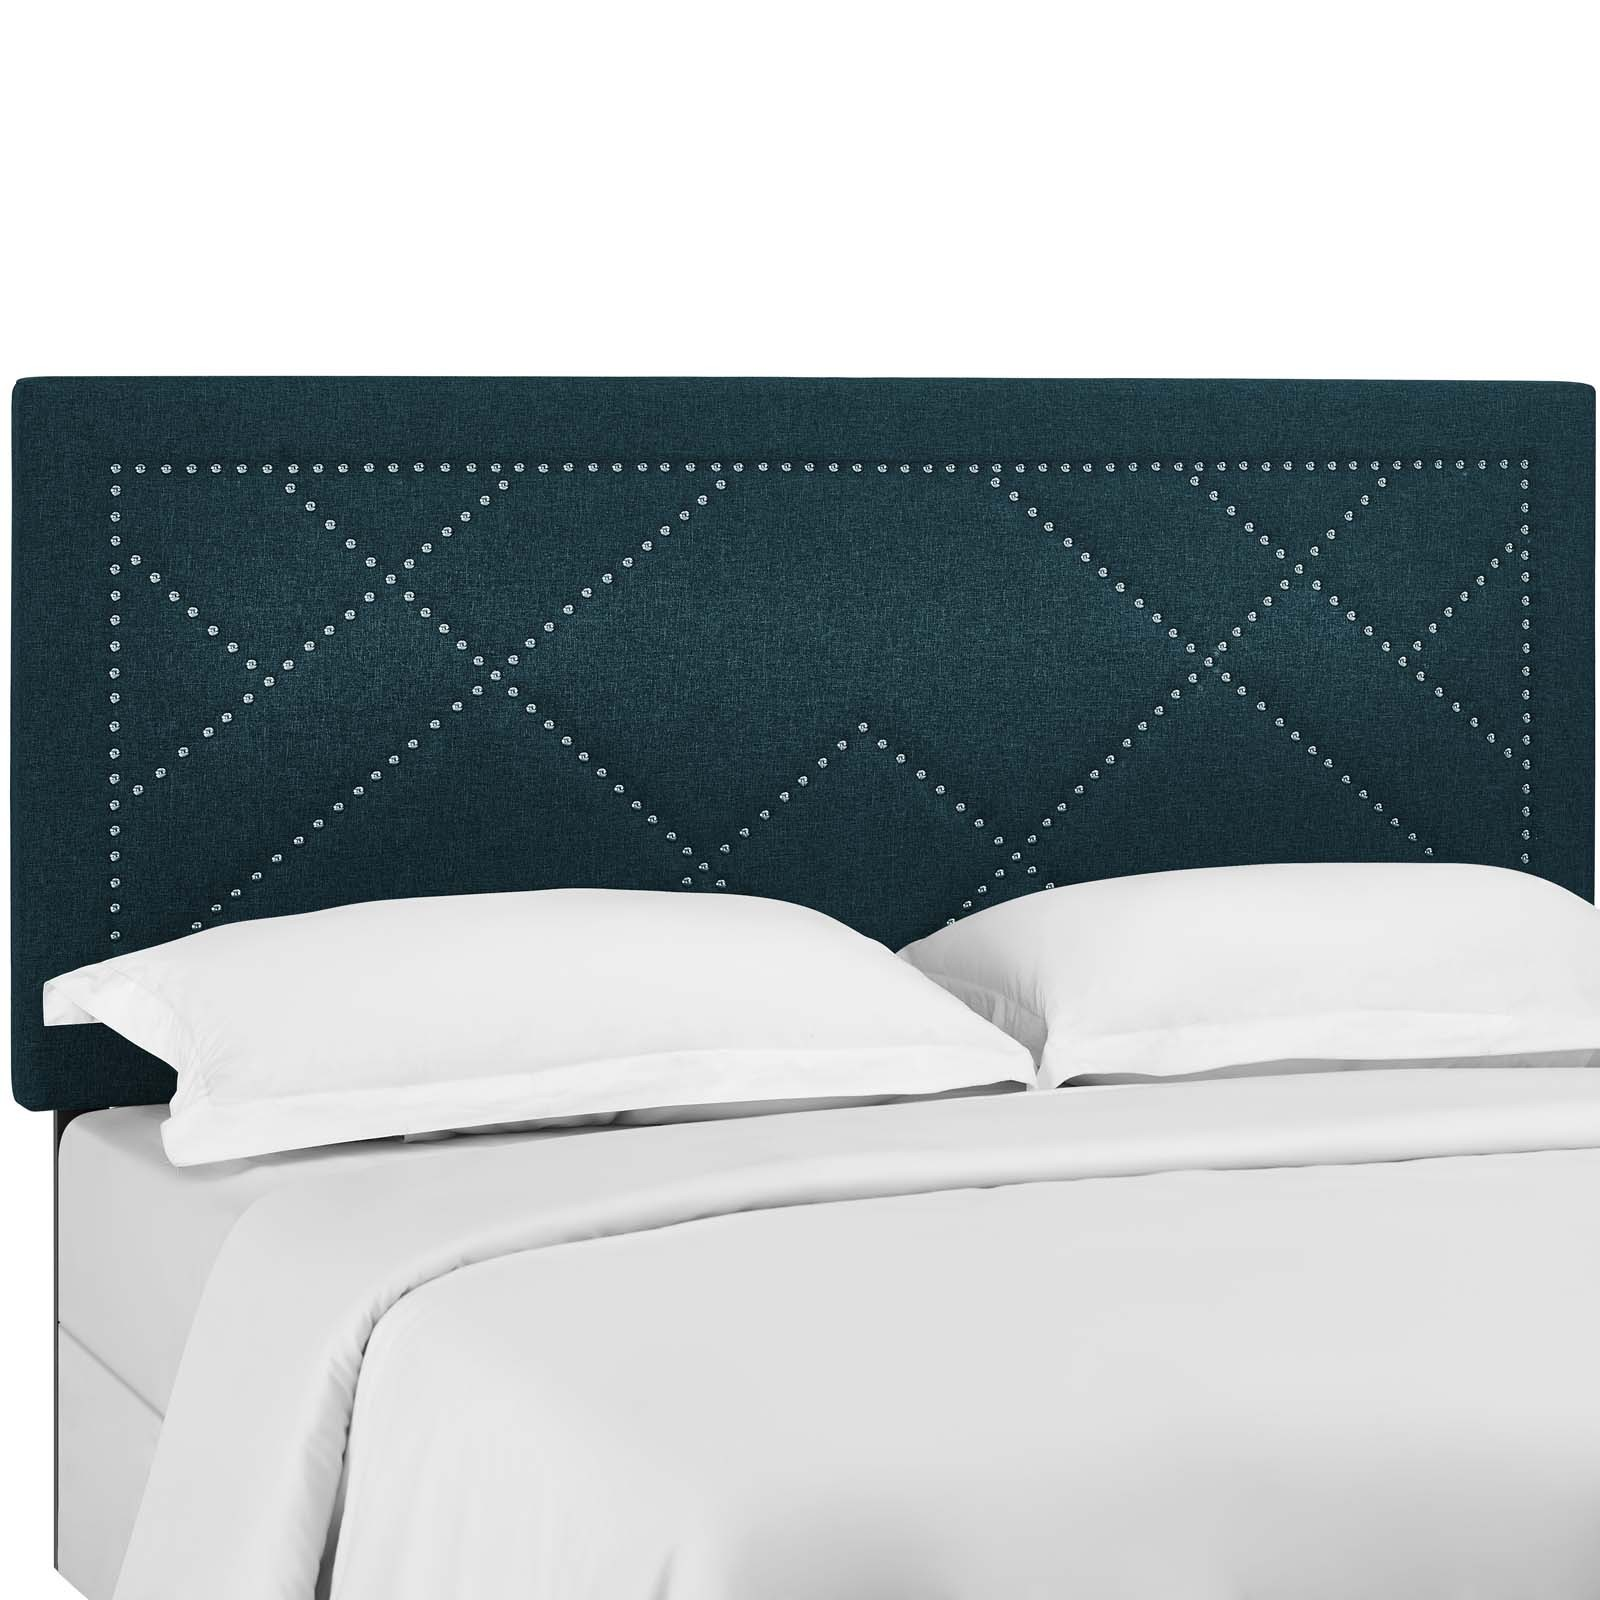 Reese Nailhead Full / Queen Upholstered Linen Fabric Headboard